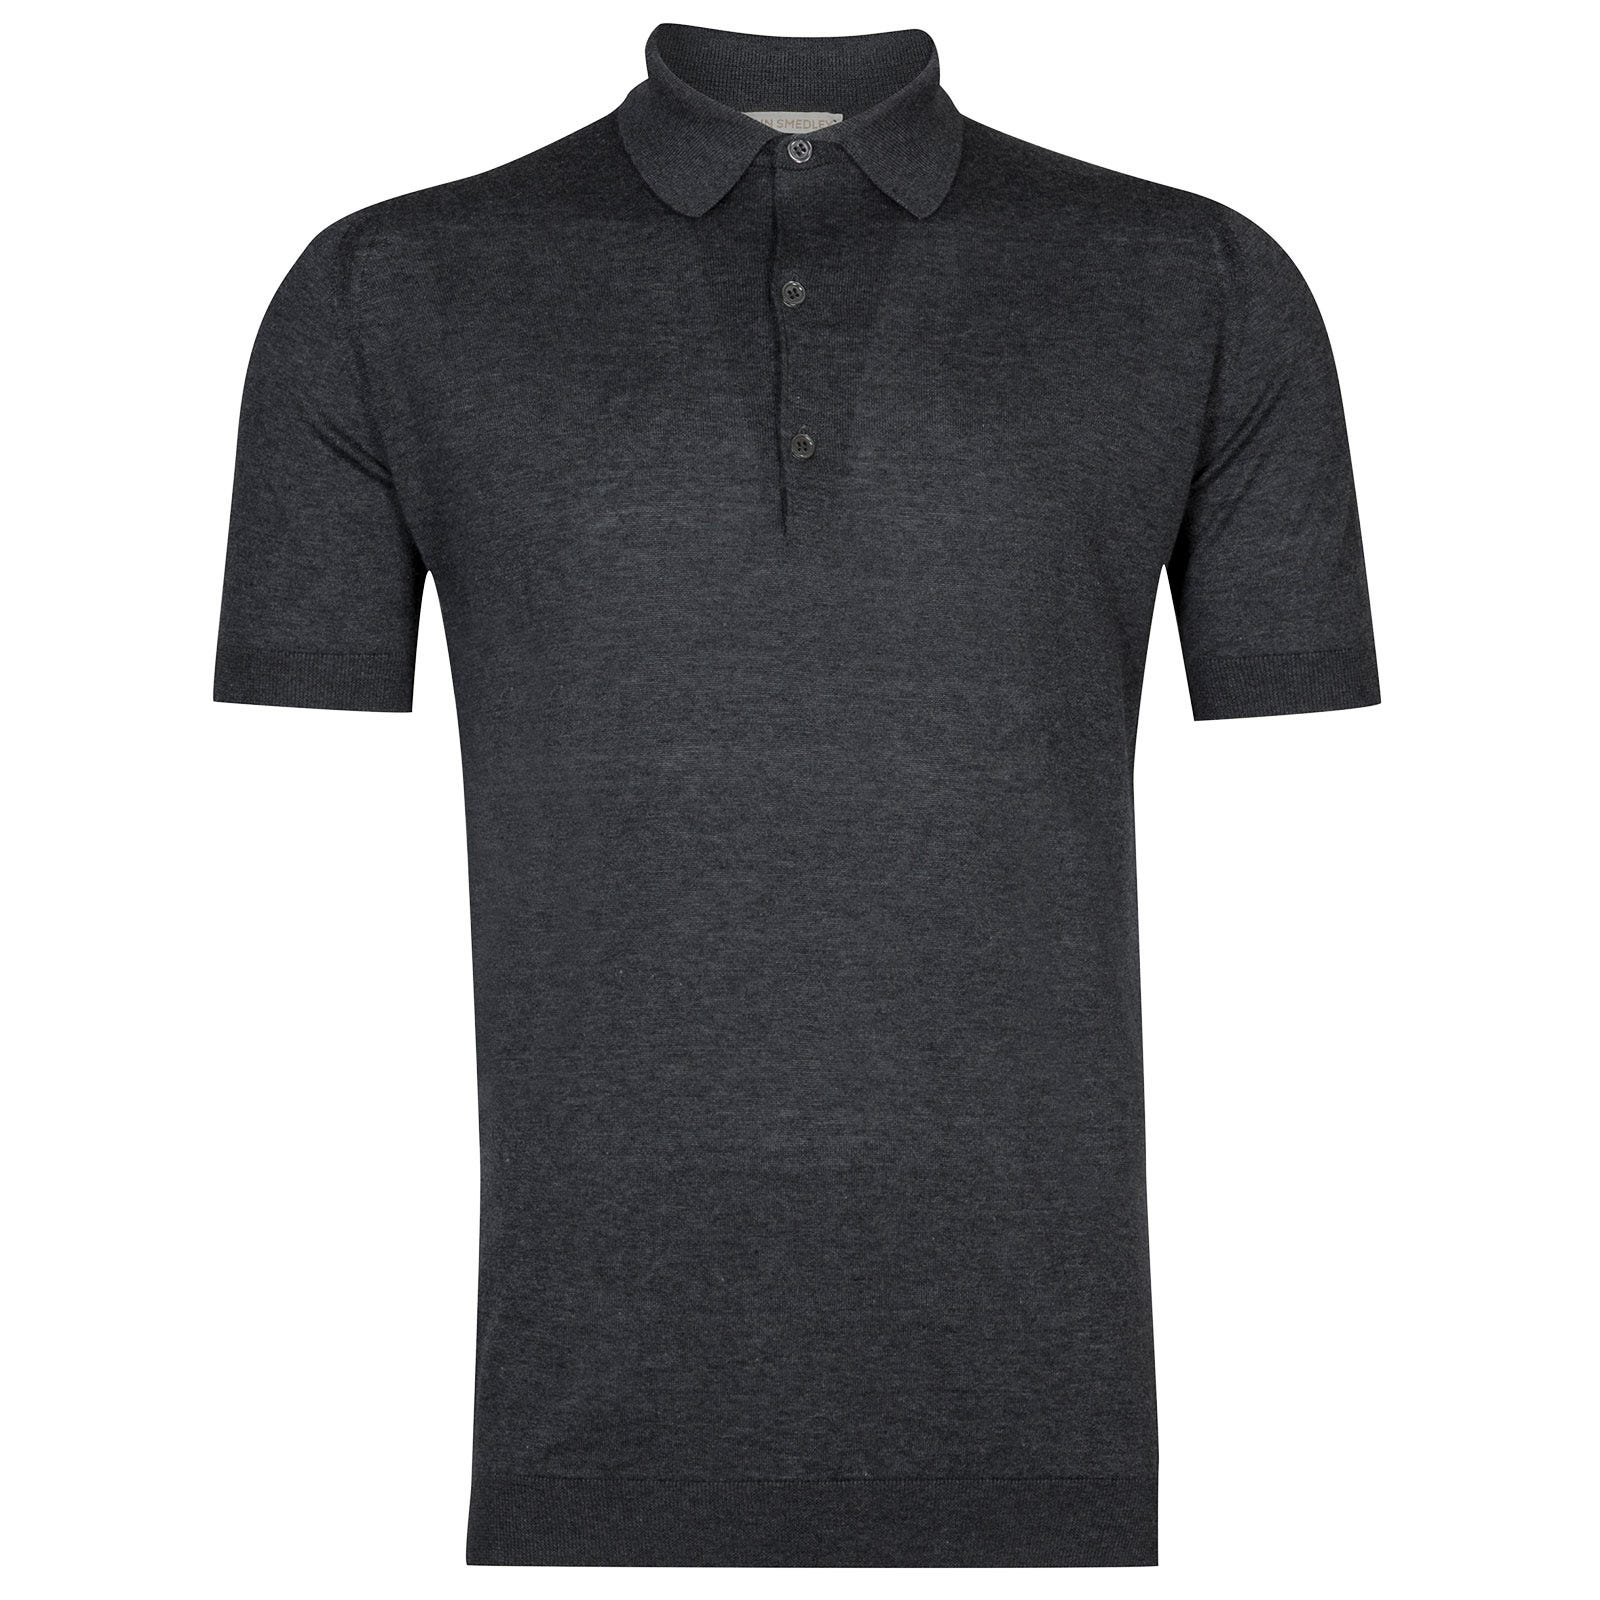 John Smedley Haddon in Charcoal Shirt-XLG